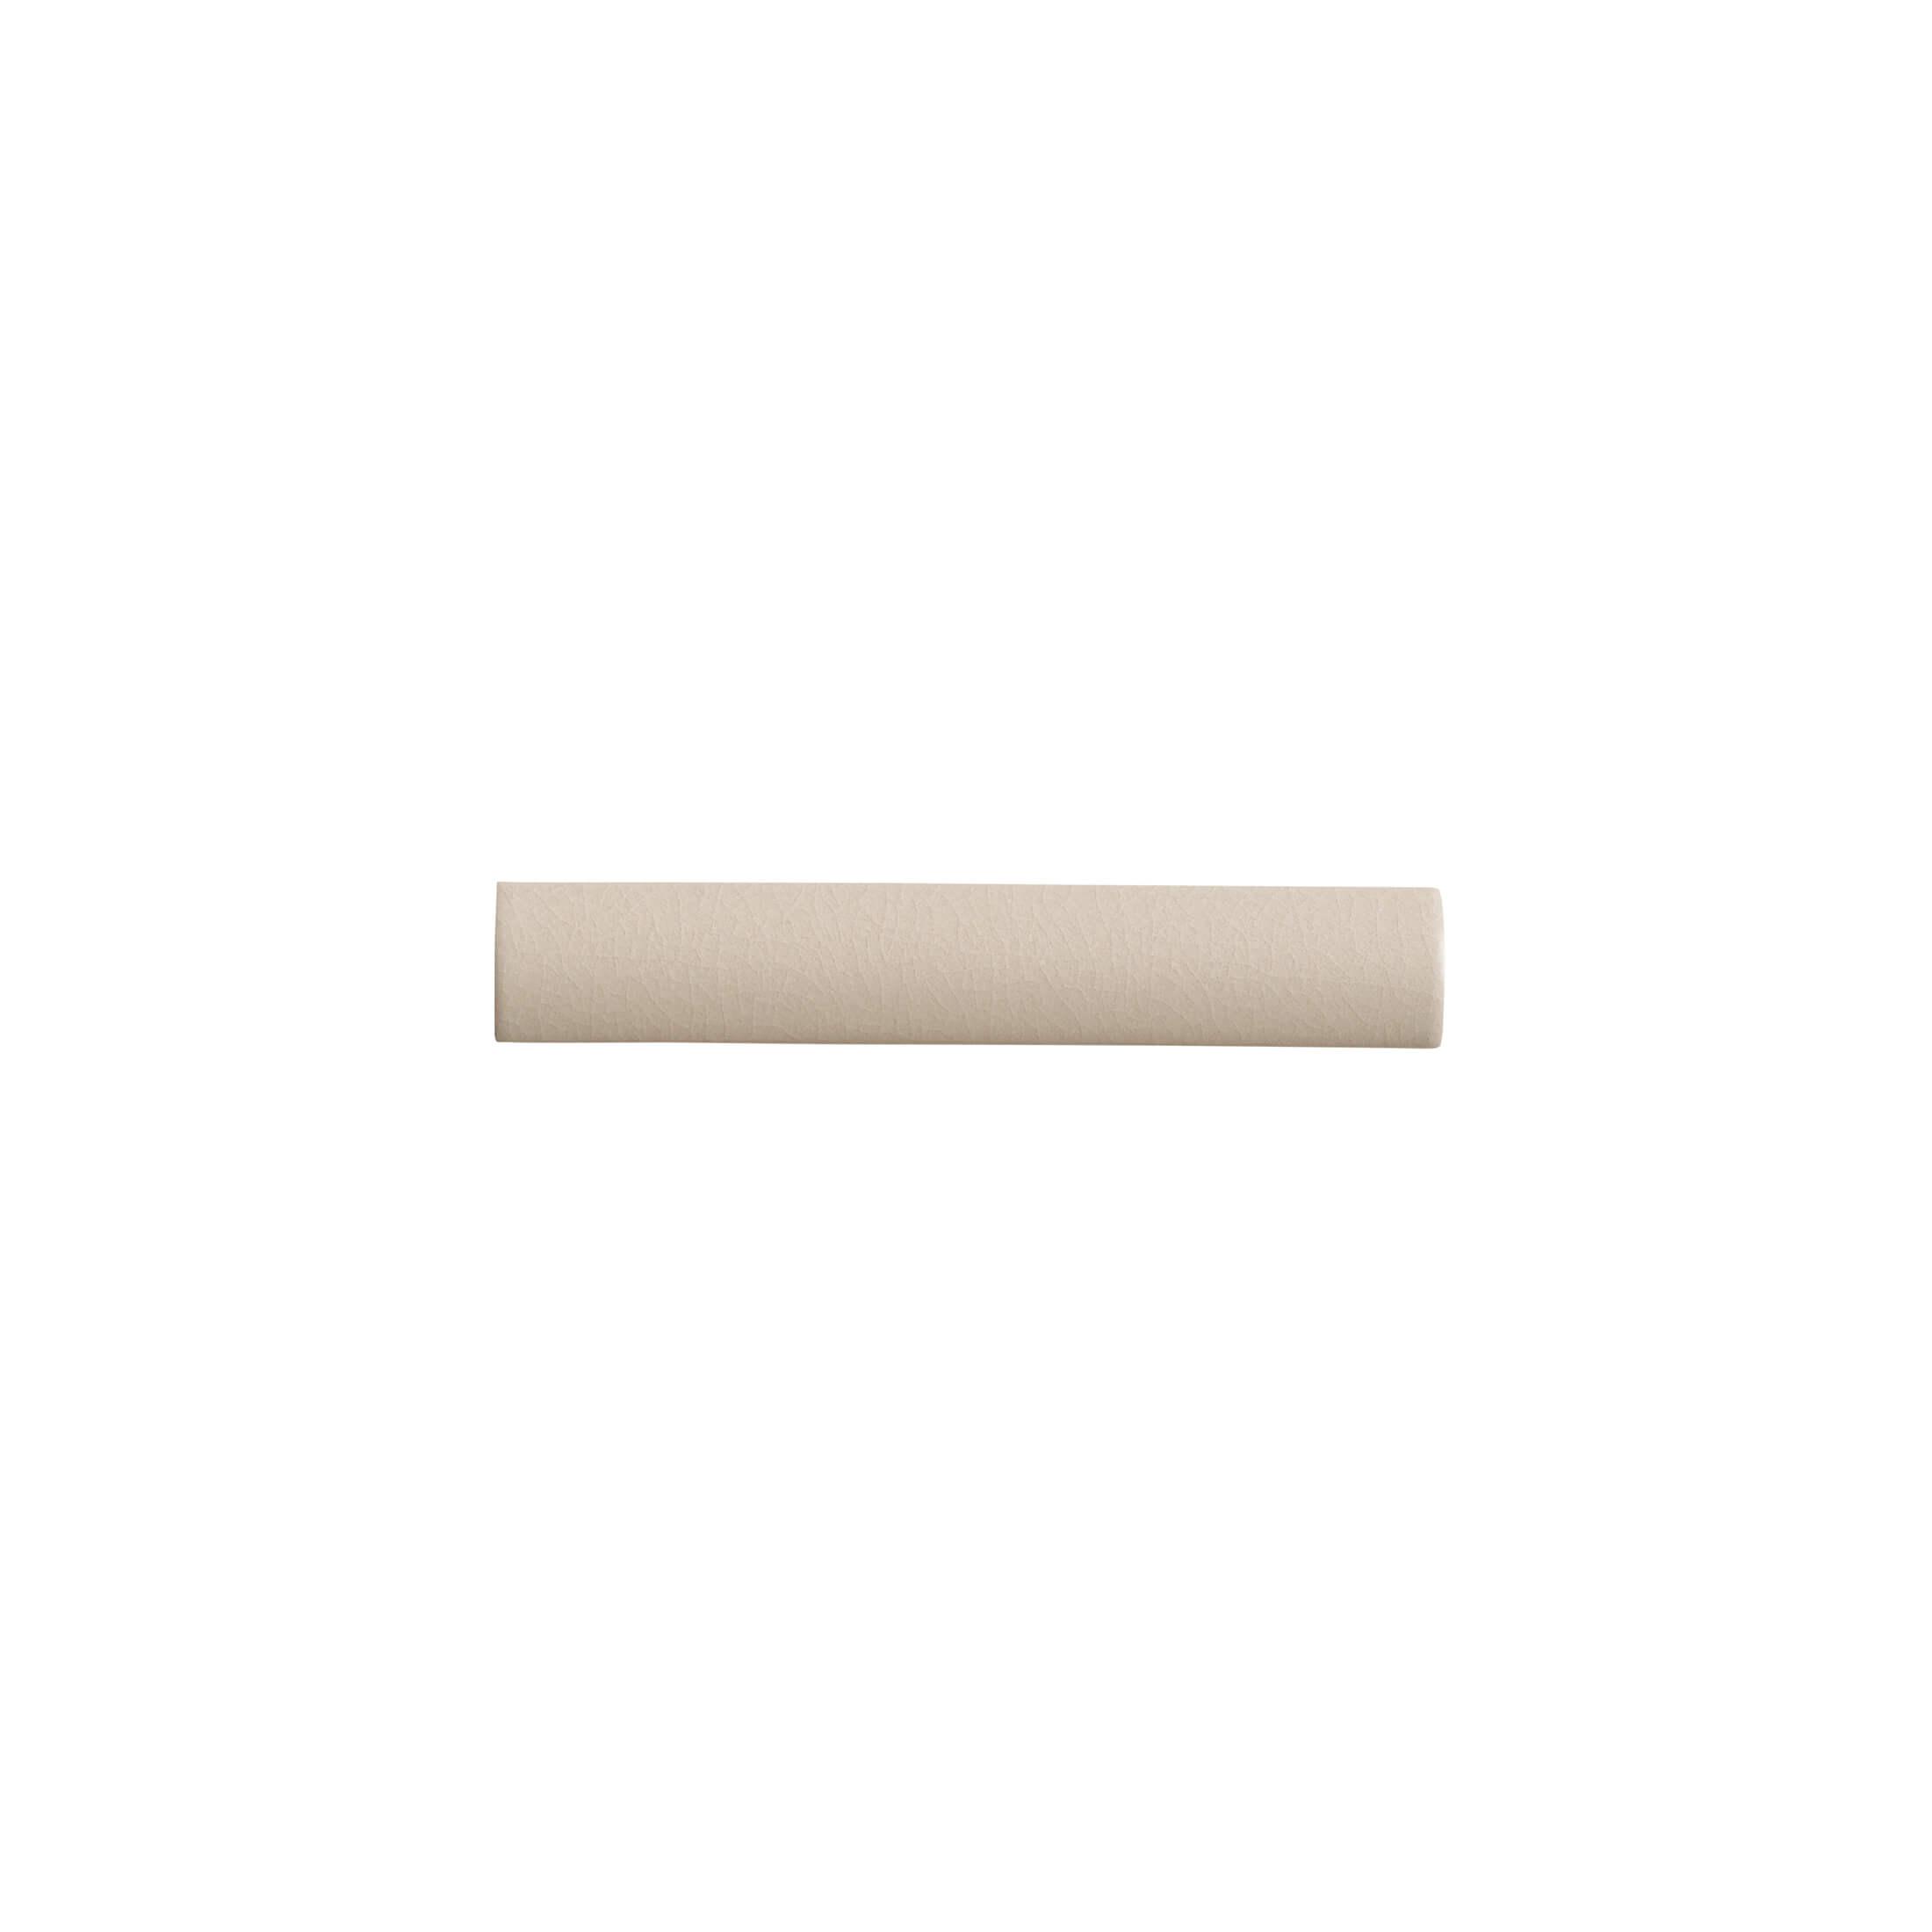 ADEH5024 - CUBRECANTO  - 2.5 cm X 15 cm